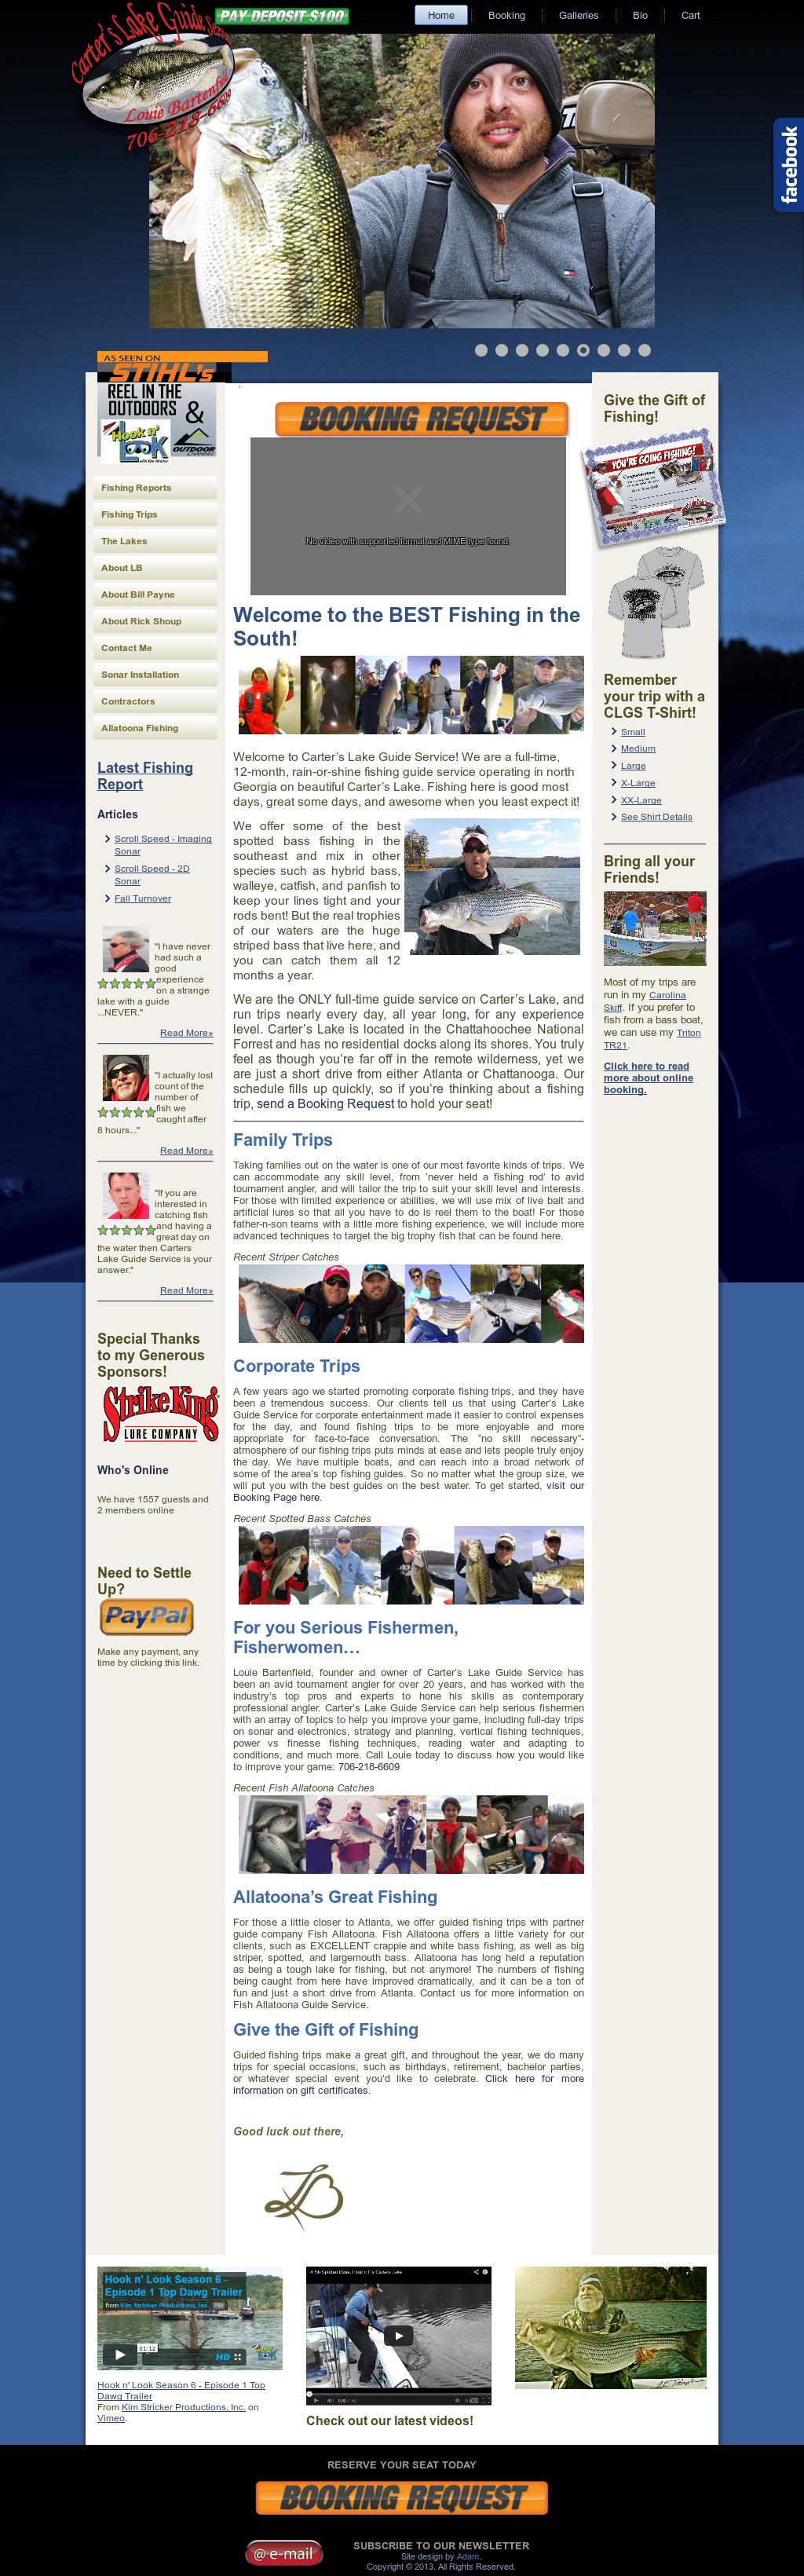 Carters lakefishing trip 8 hours | backwoods fishing guide.